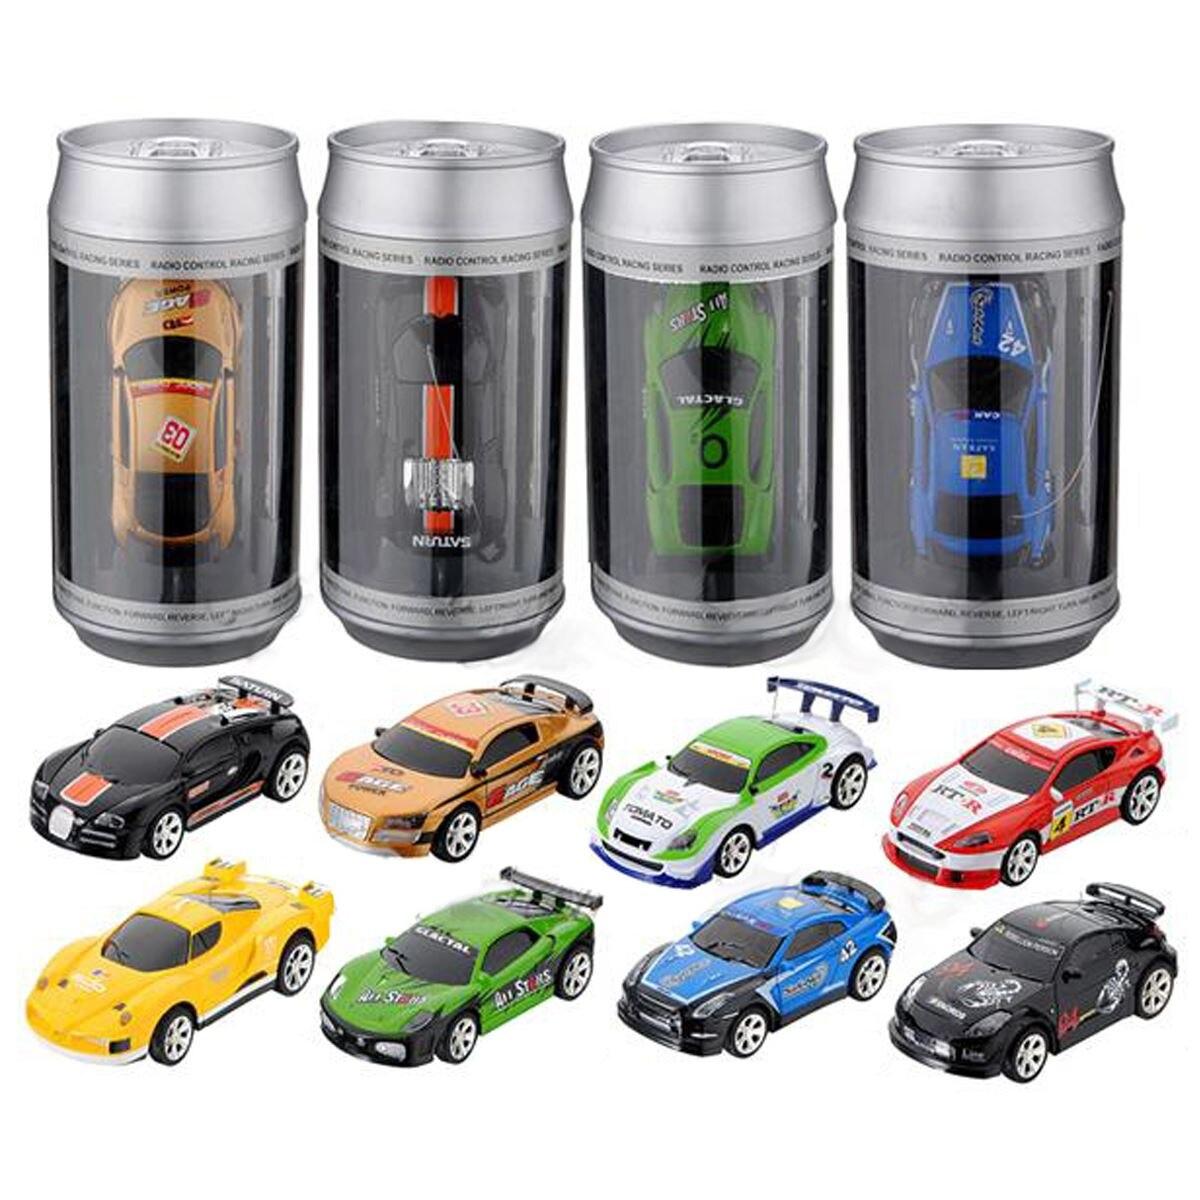 20KM/H Coke Mini Car Radio Remote Control Micro Racing 4 Frequencies